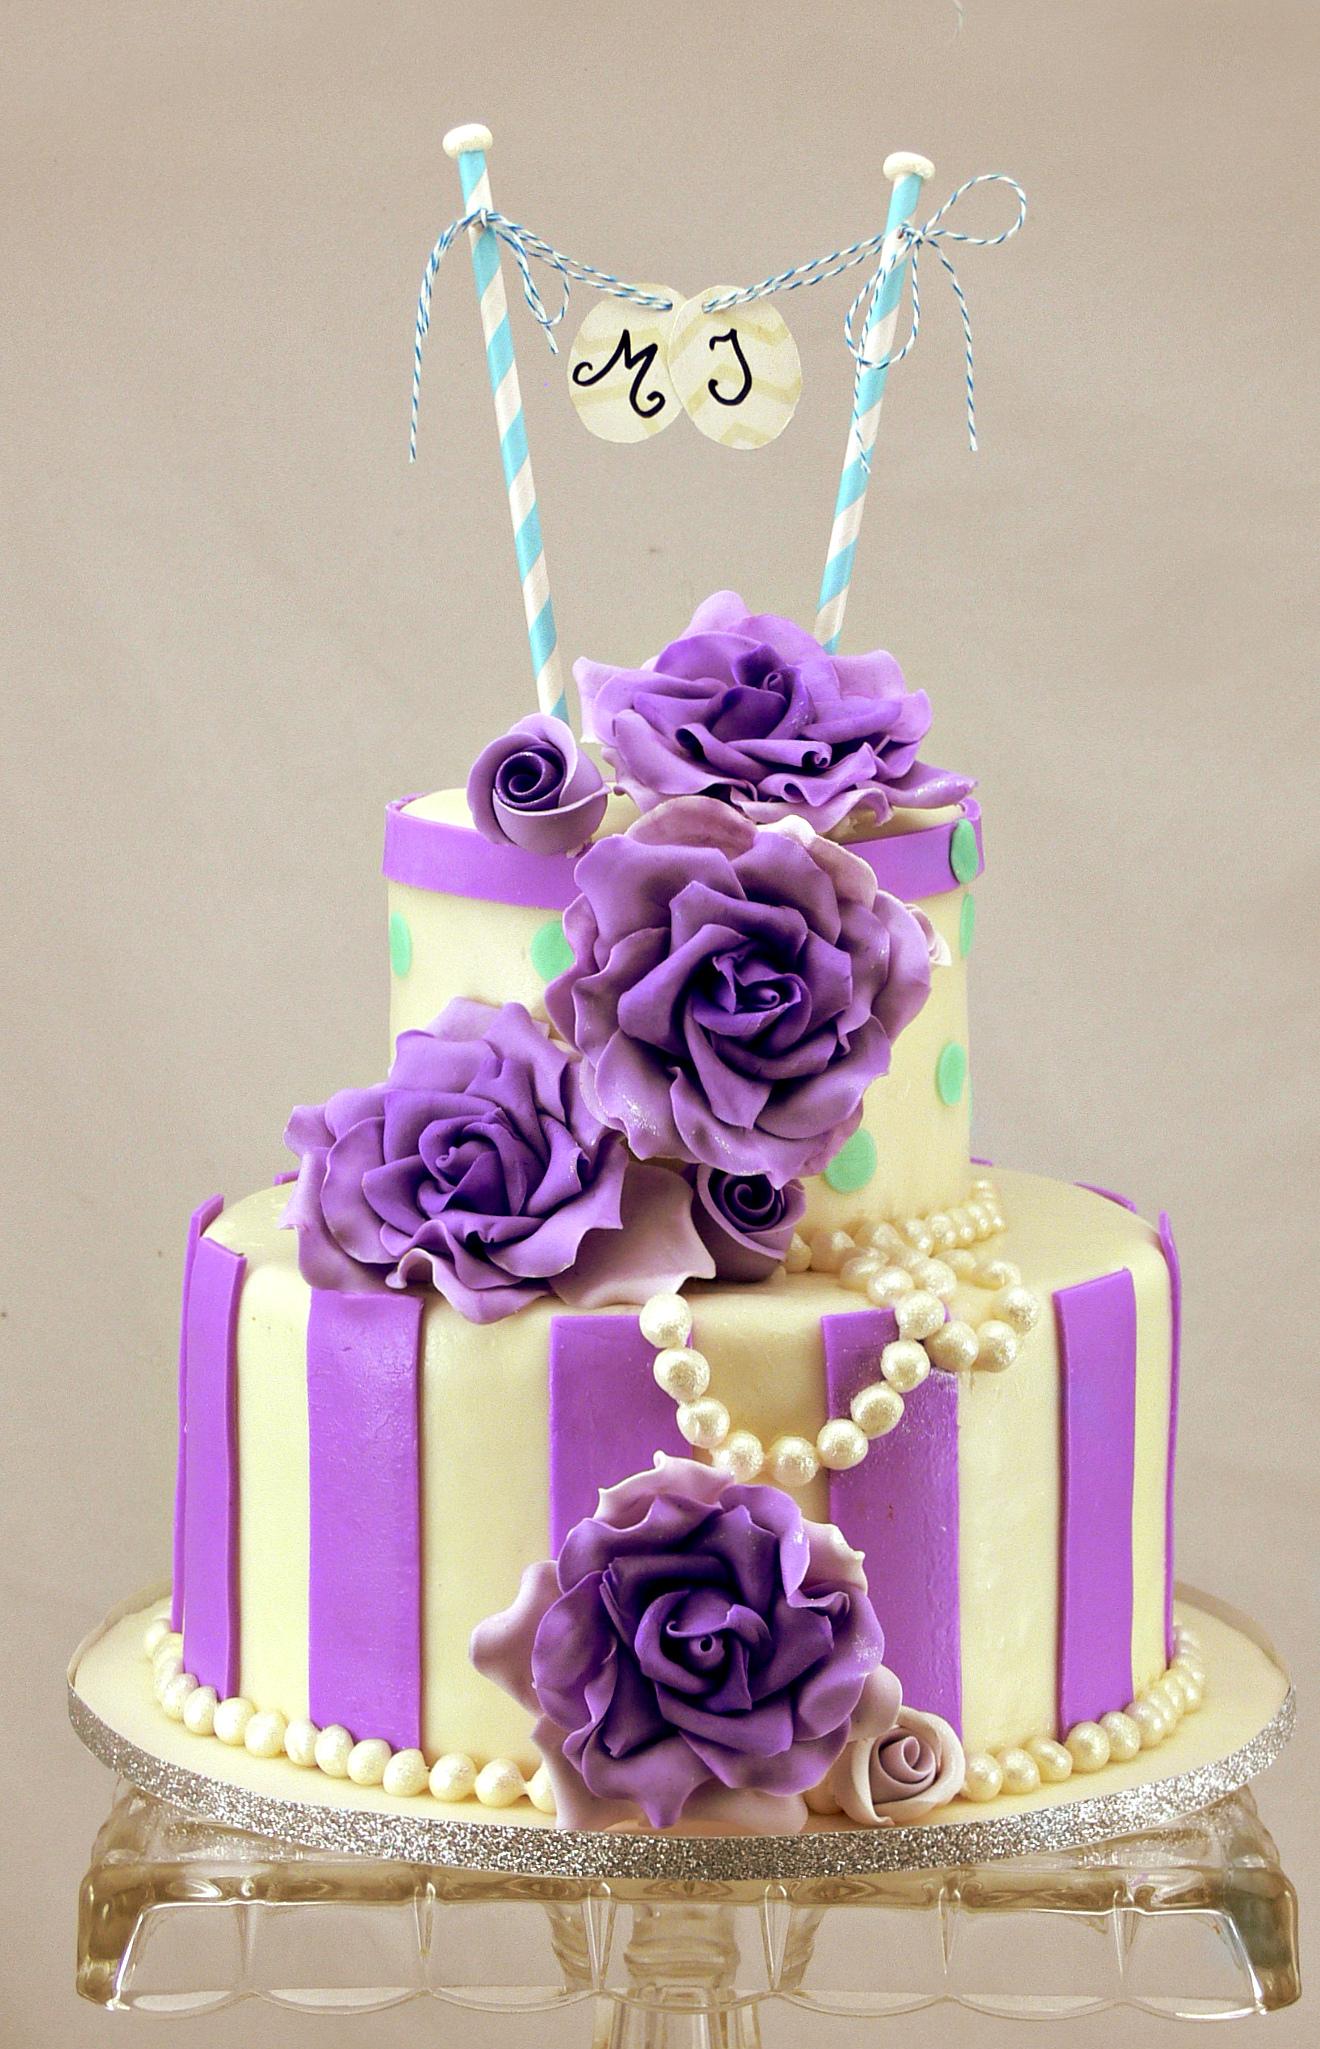 Melissa shower cake purple roses british style.jpg